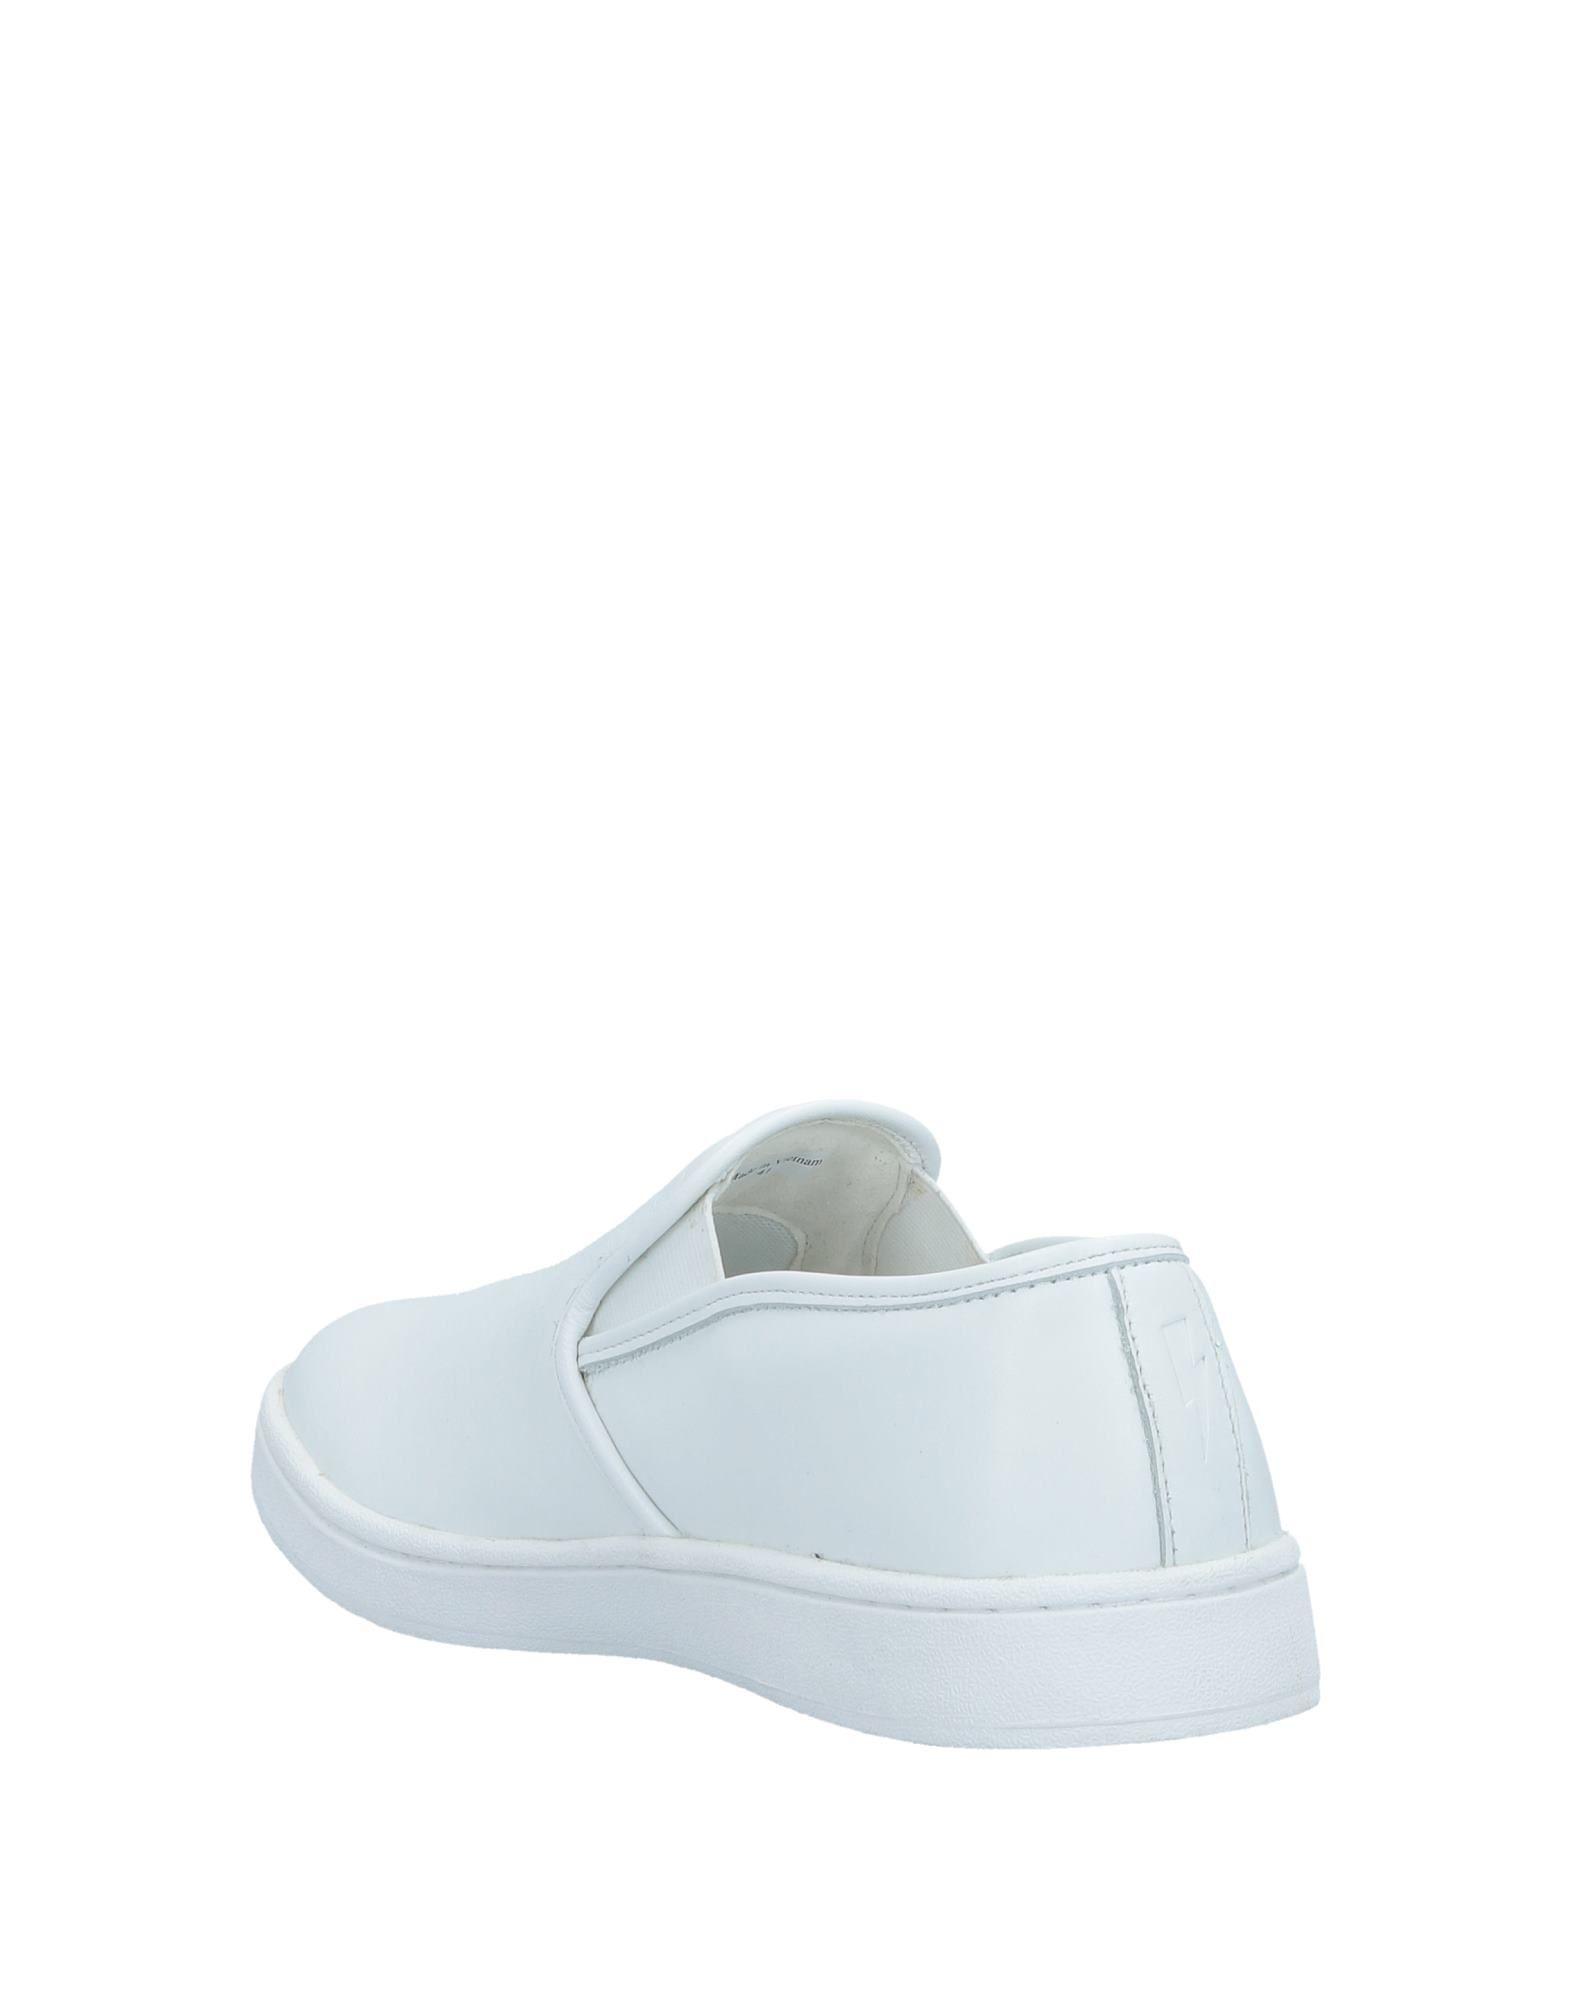 Neil Barrett Sneakers Schuhe Herren  11522211QG Neue Schuhe Sneakers 77994b